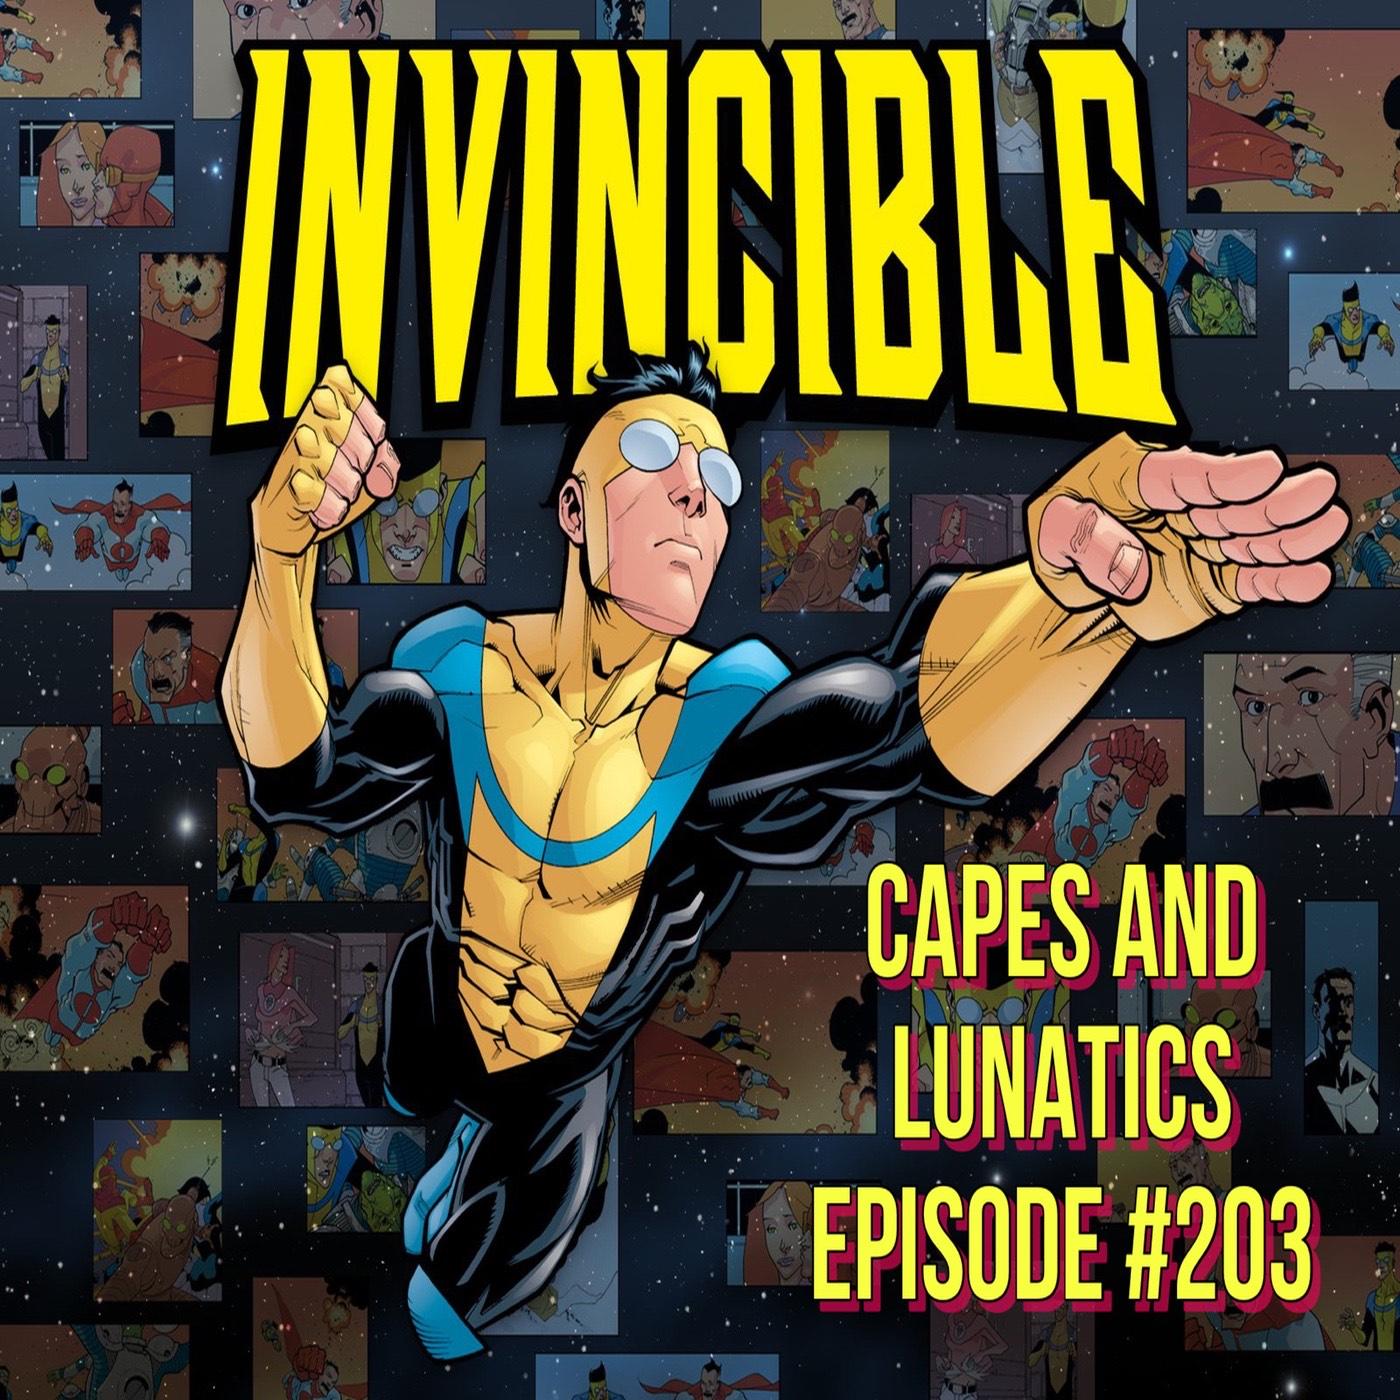 Invincible Episodes 1-4